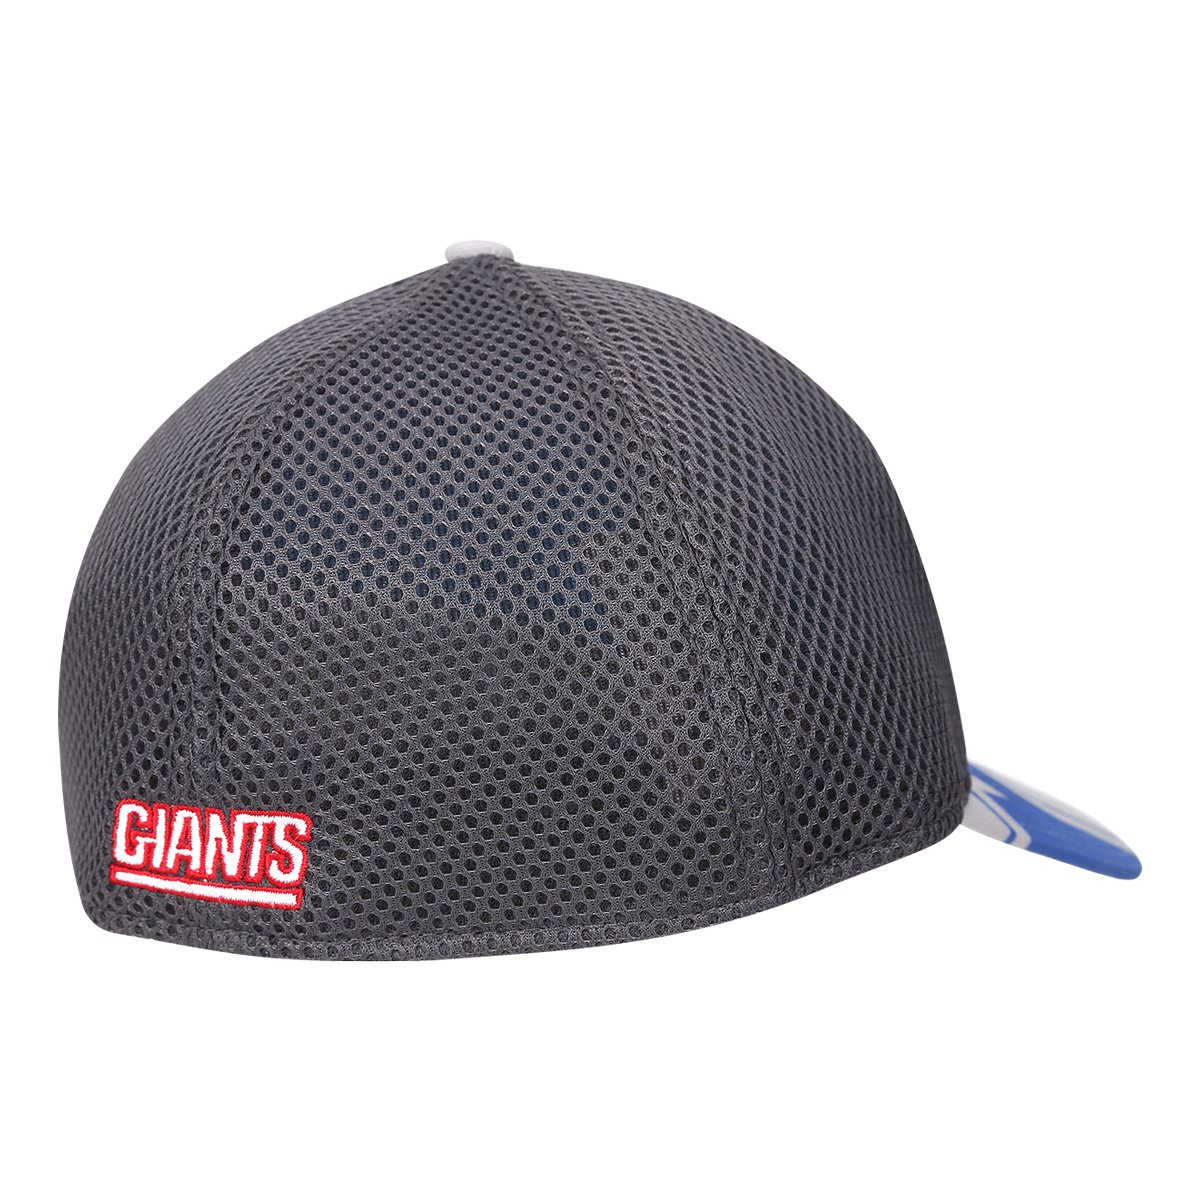 8050162fcaaff Boné New Era New York Giants Aba Curva 3930 Spotlight Masculino ...